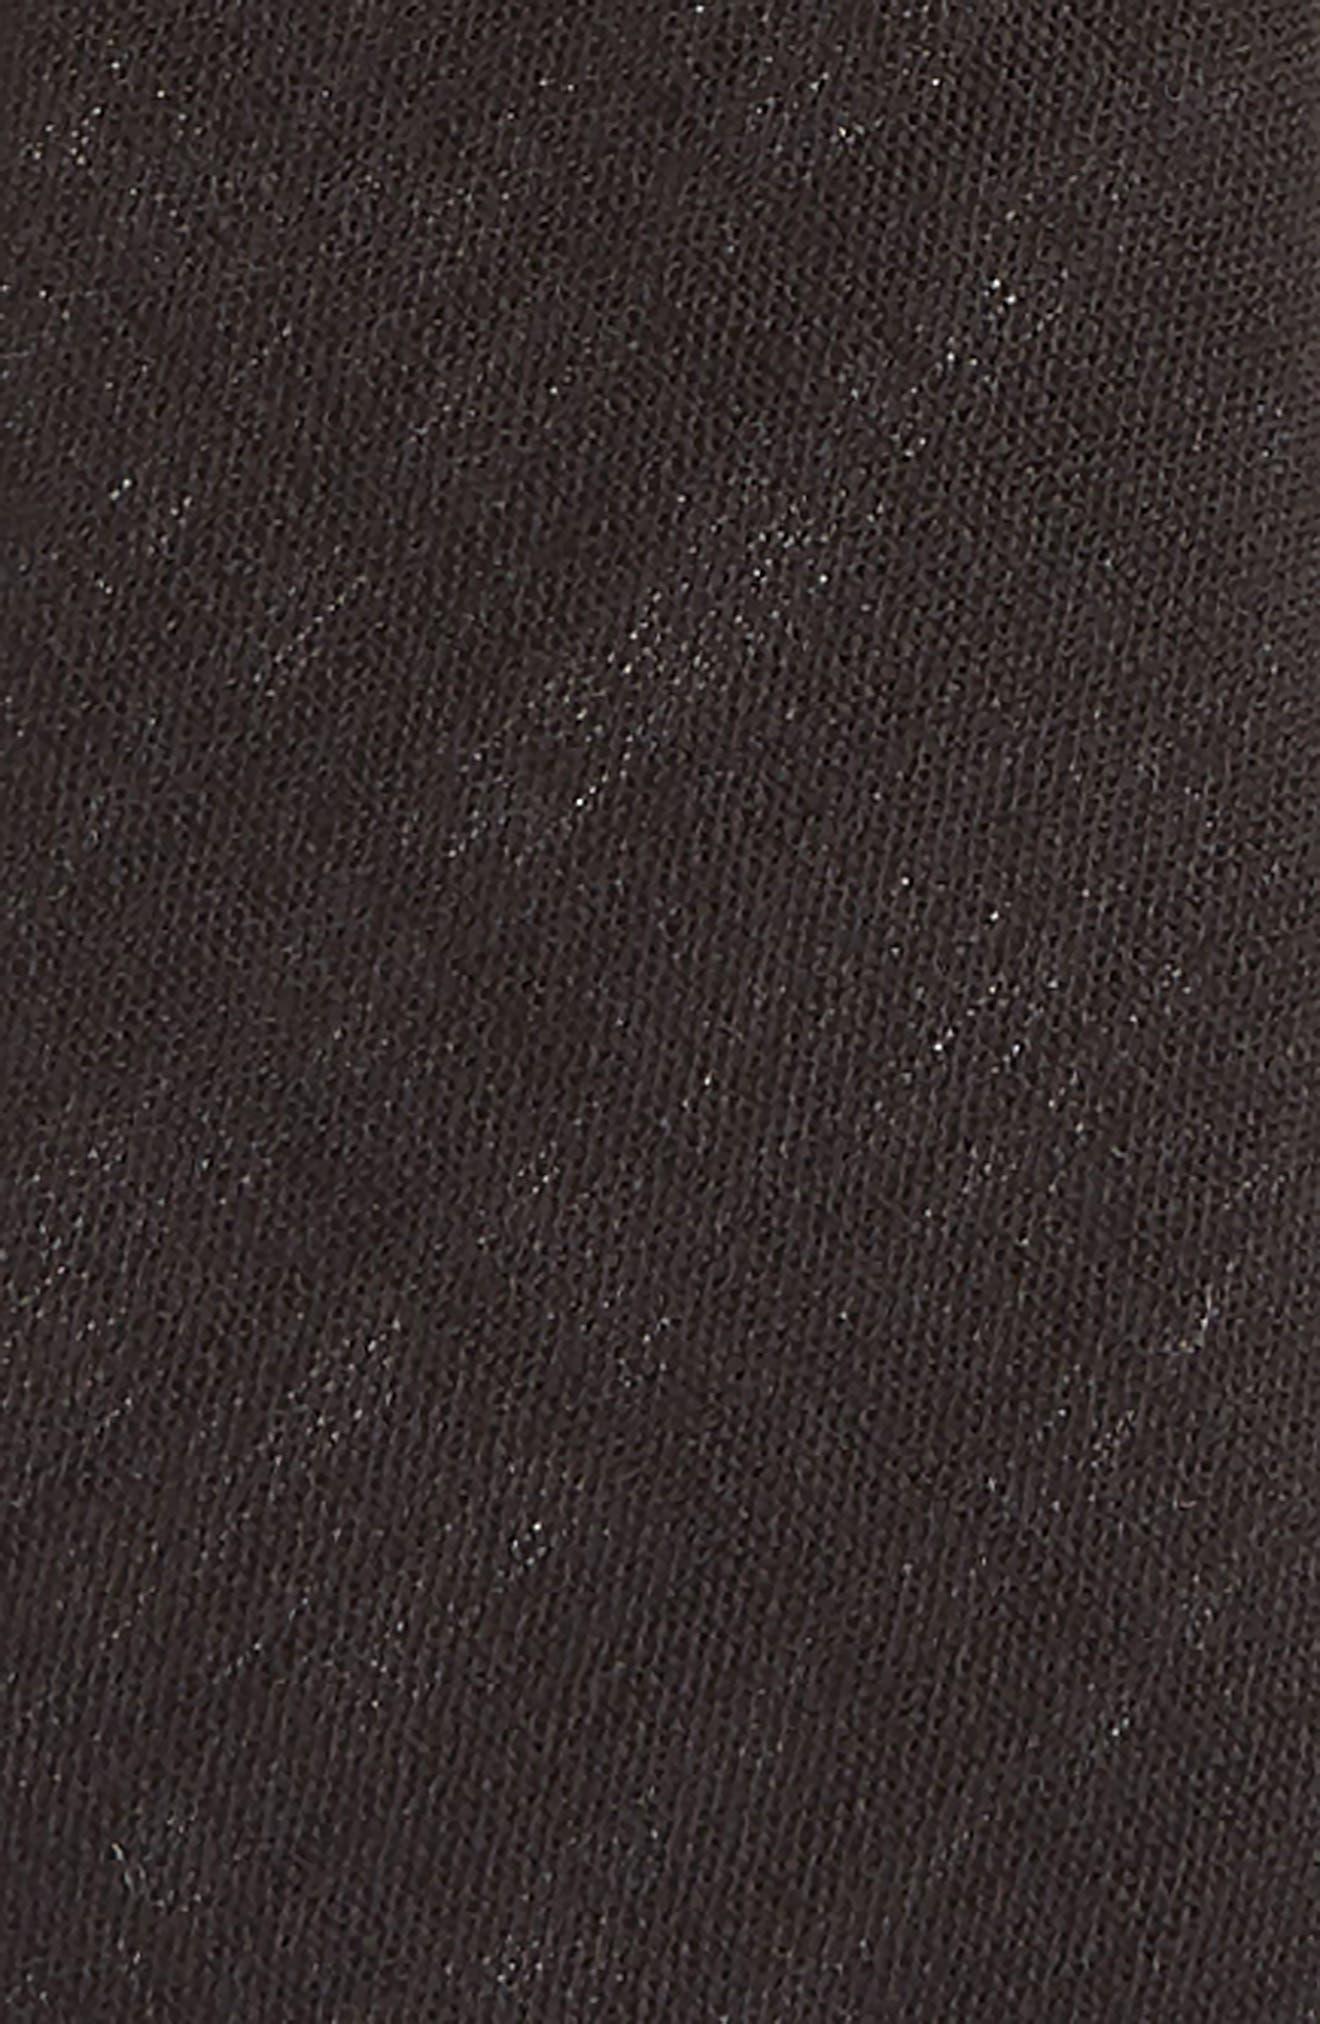 NORDSTROM,                             Solid Zip Tie,                             Alternate thumbnail 2, color,                             001